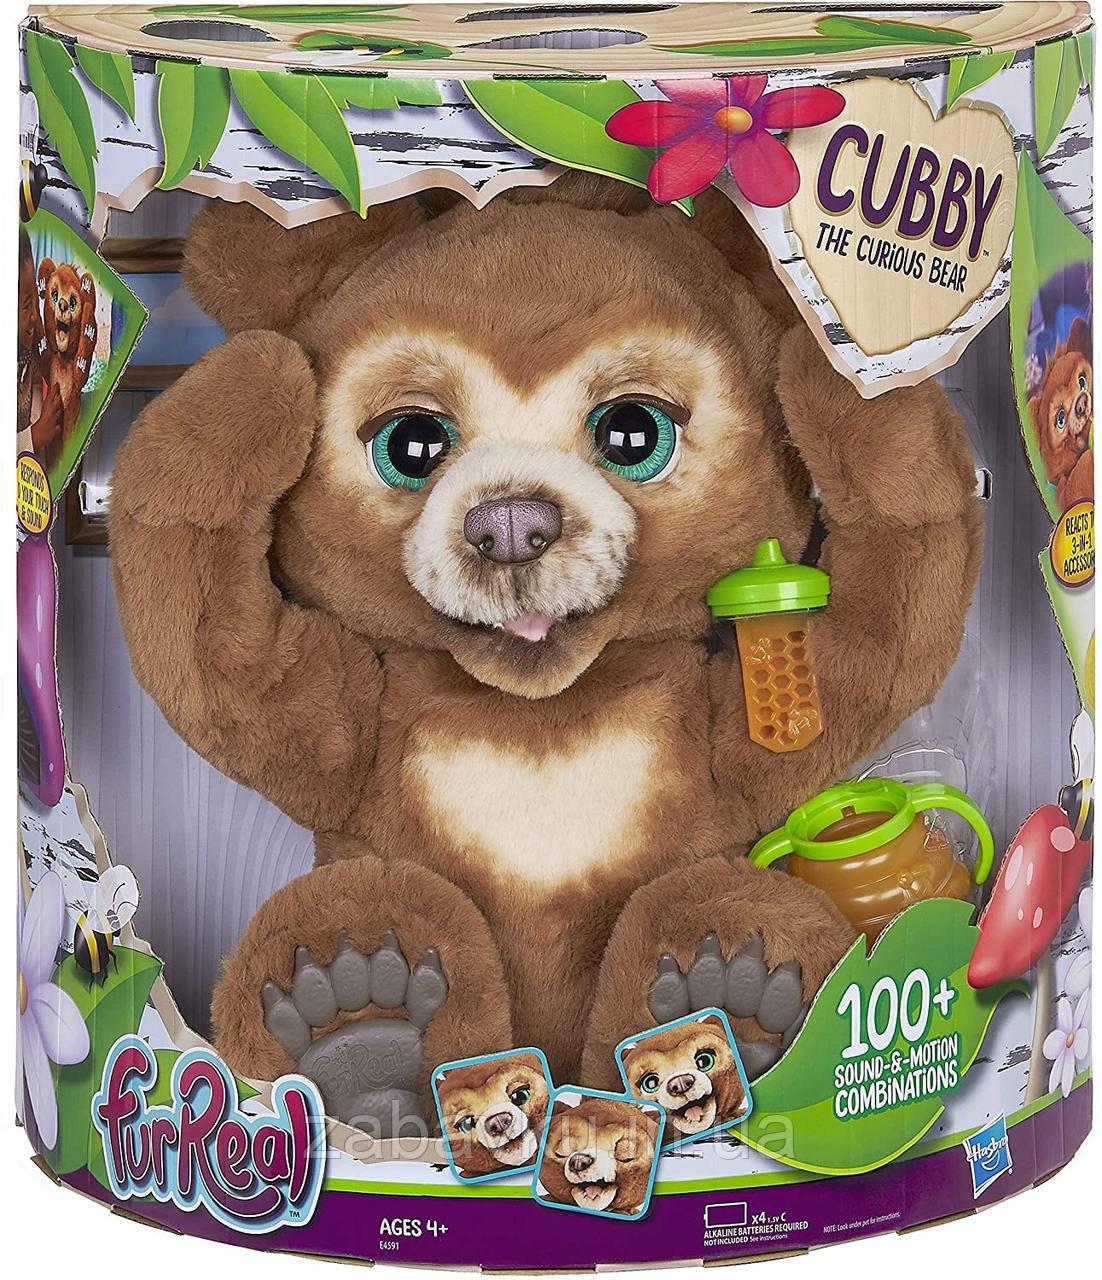 Інтерактивний ведмедик Каббі Хасбро FurReal Cubby, The Curious Bear Interactive Plush Toy